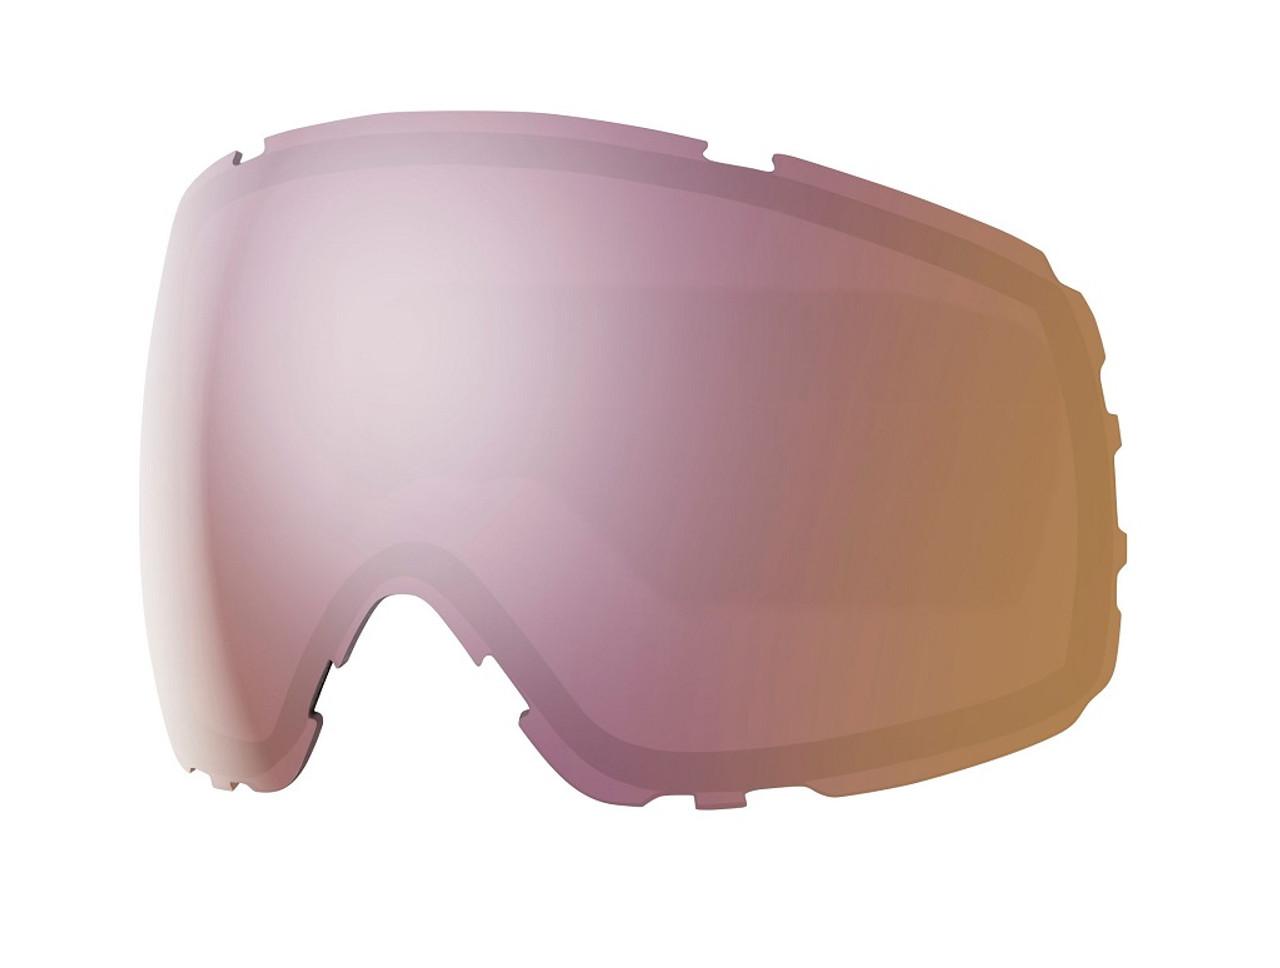 Chromapop Everyday Rose Gold Mirror - Smith Proxy Replacement Lenses